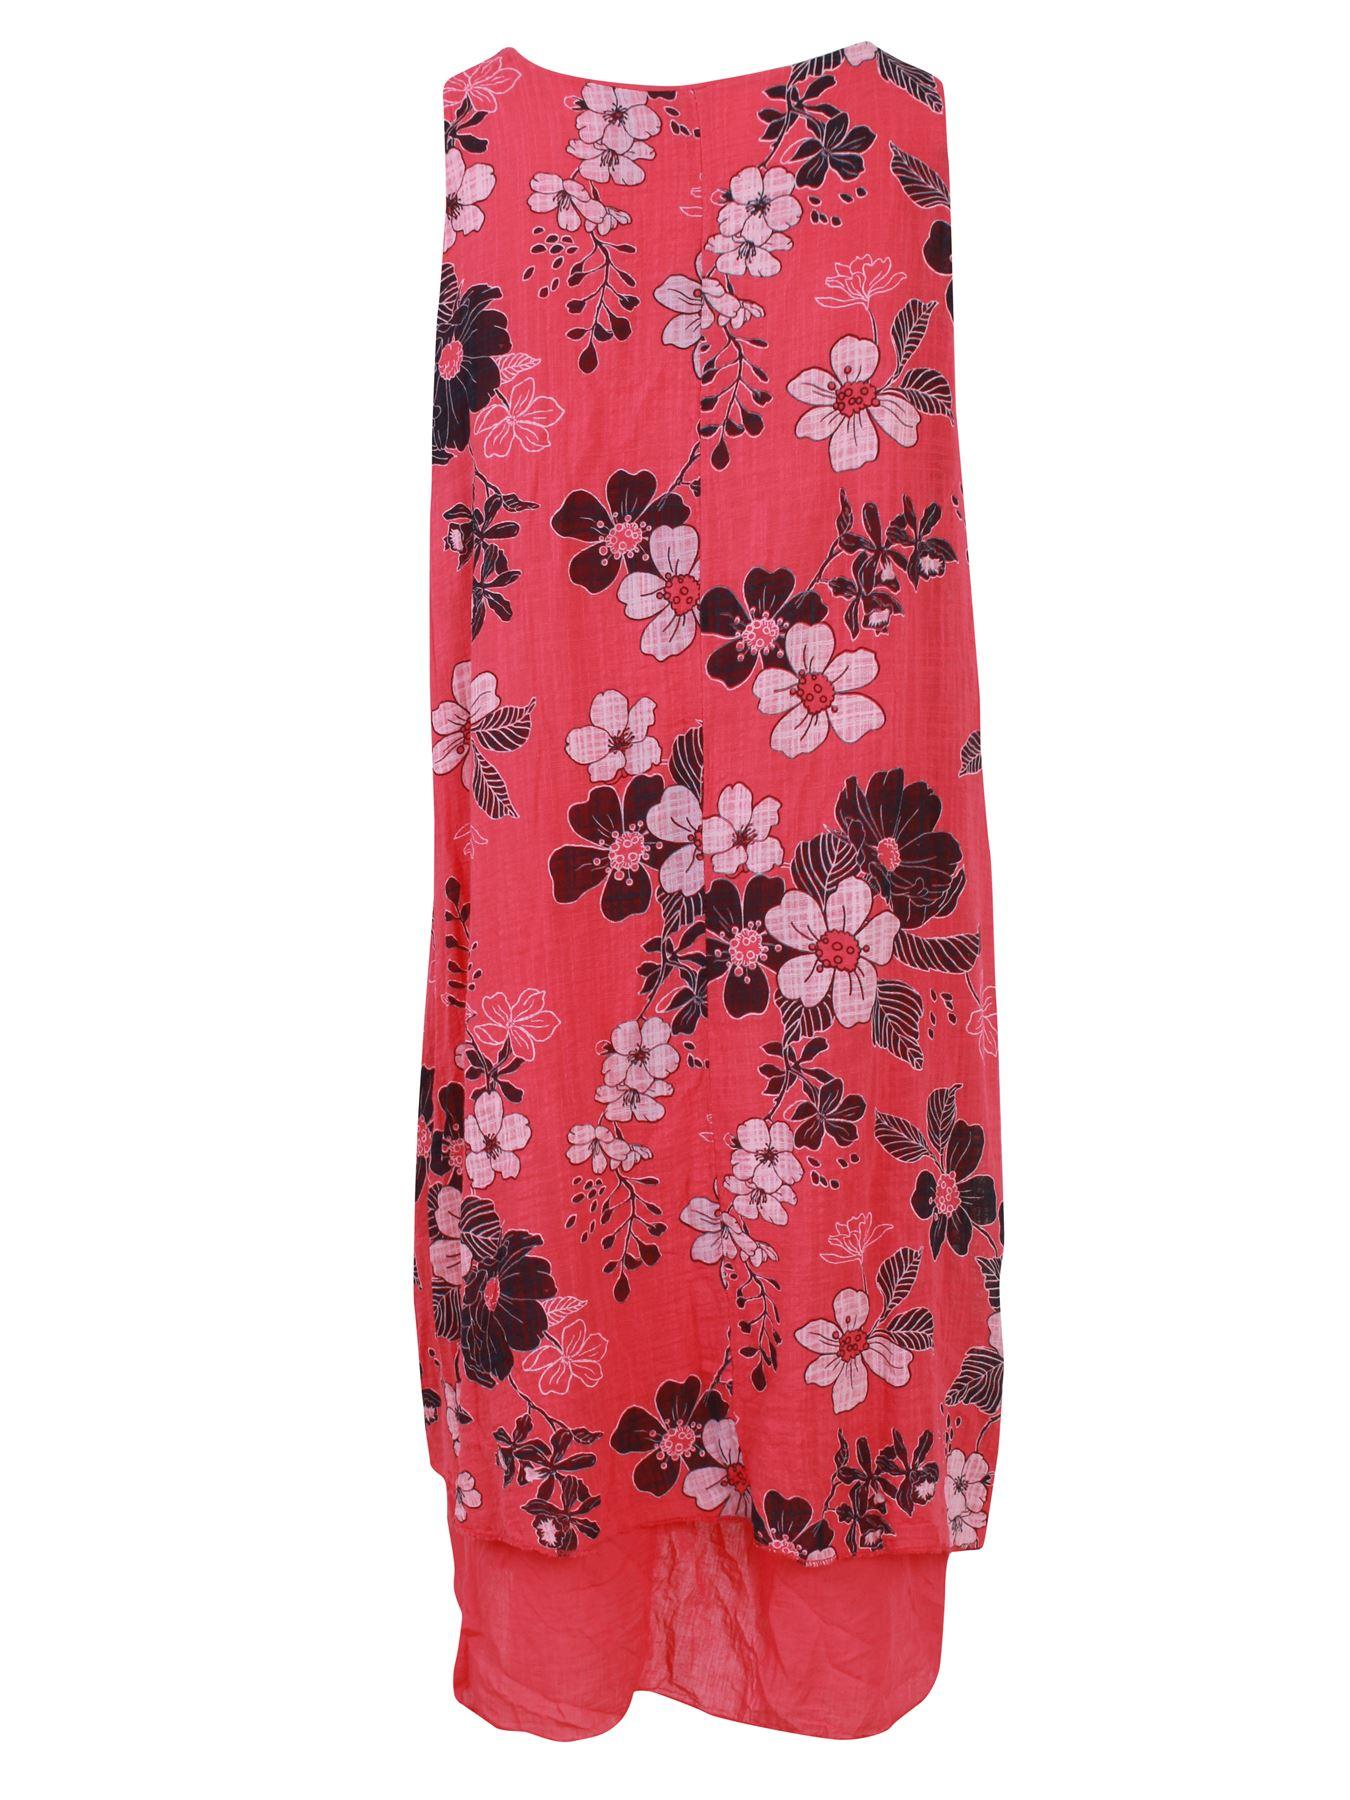 Womens-Floral-Print-Italian-Fashion-Lagenlook-Summer-Cotton-Crew-Neck-Dress thumbnail 15